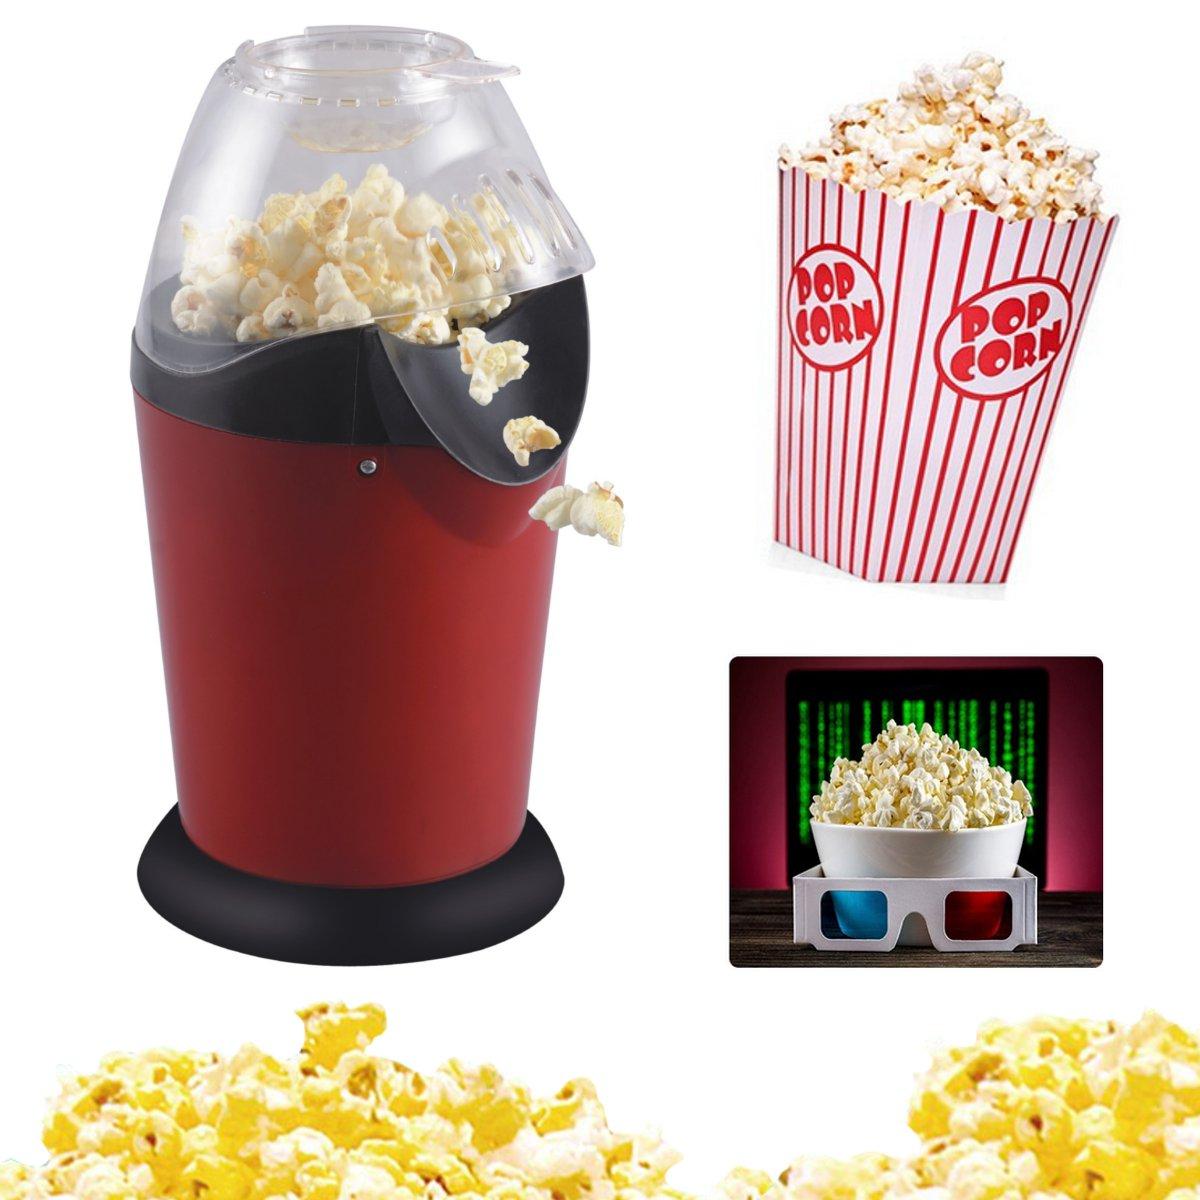 1200W Electric Corn Popcorn Maker Household Automatic Mini Hot Air Popcorn Making Machine DIY Corn Popper 110V 220V